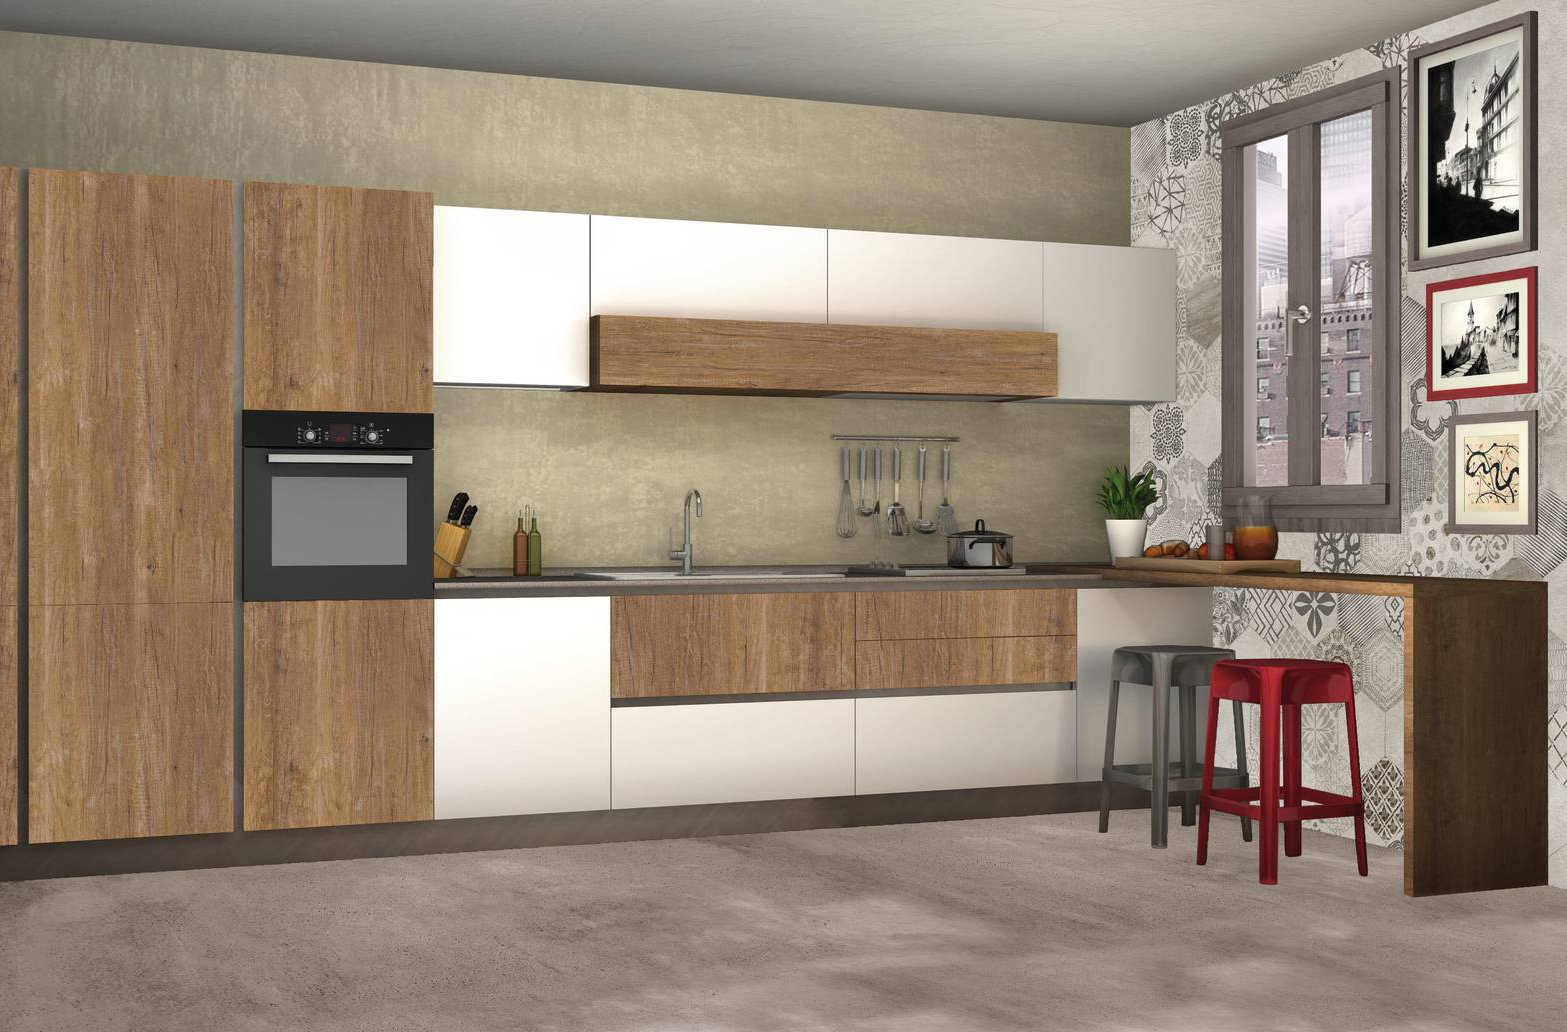 4 progetti cucina per 10 mq circa cose di casa - Arredare cucina 4 mq ...